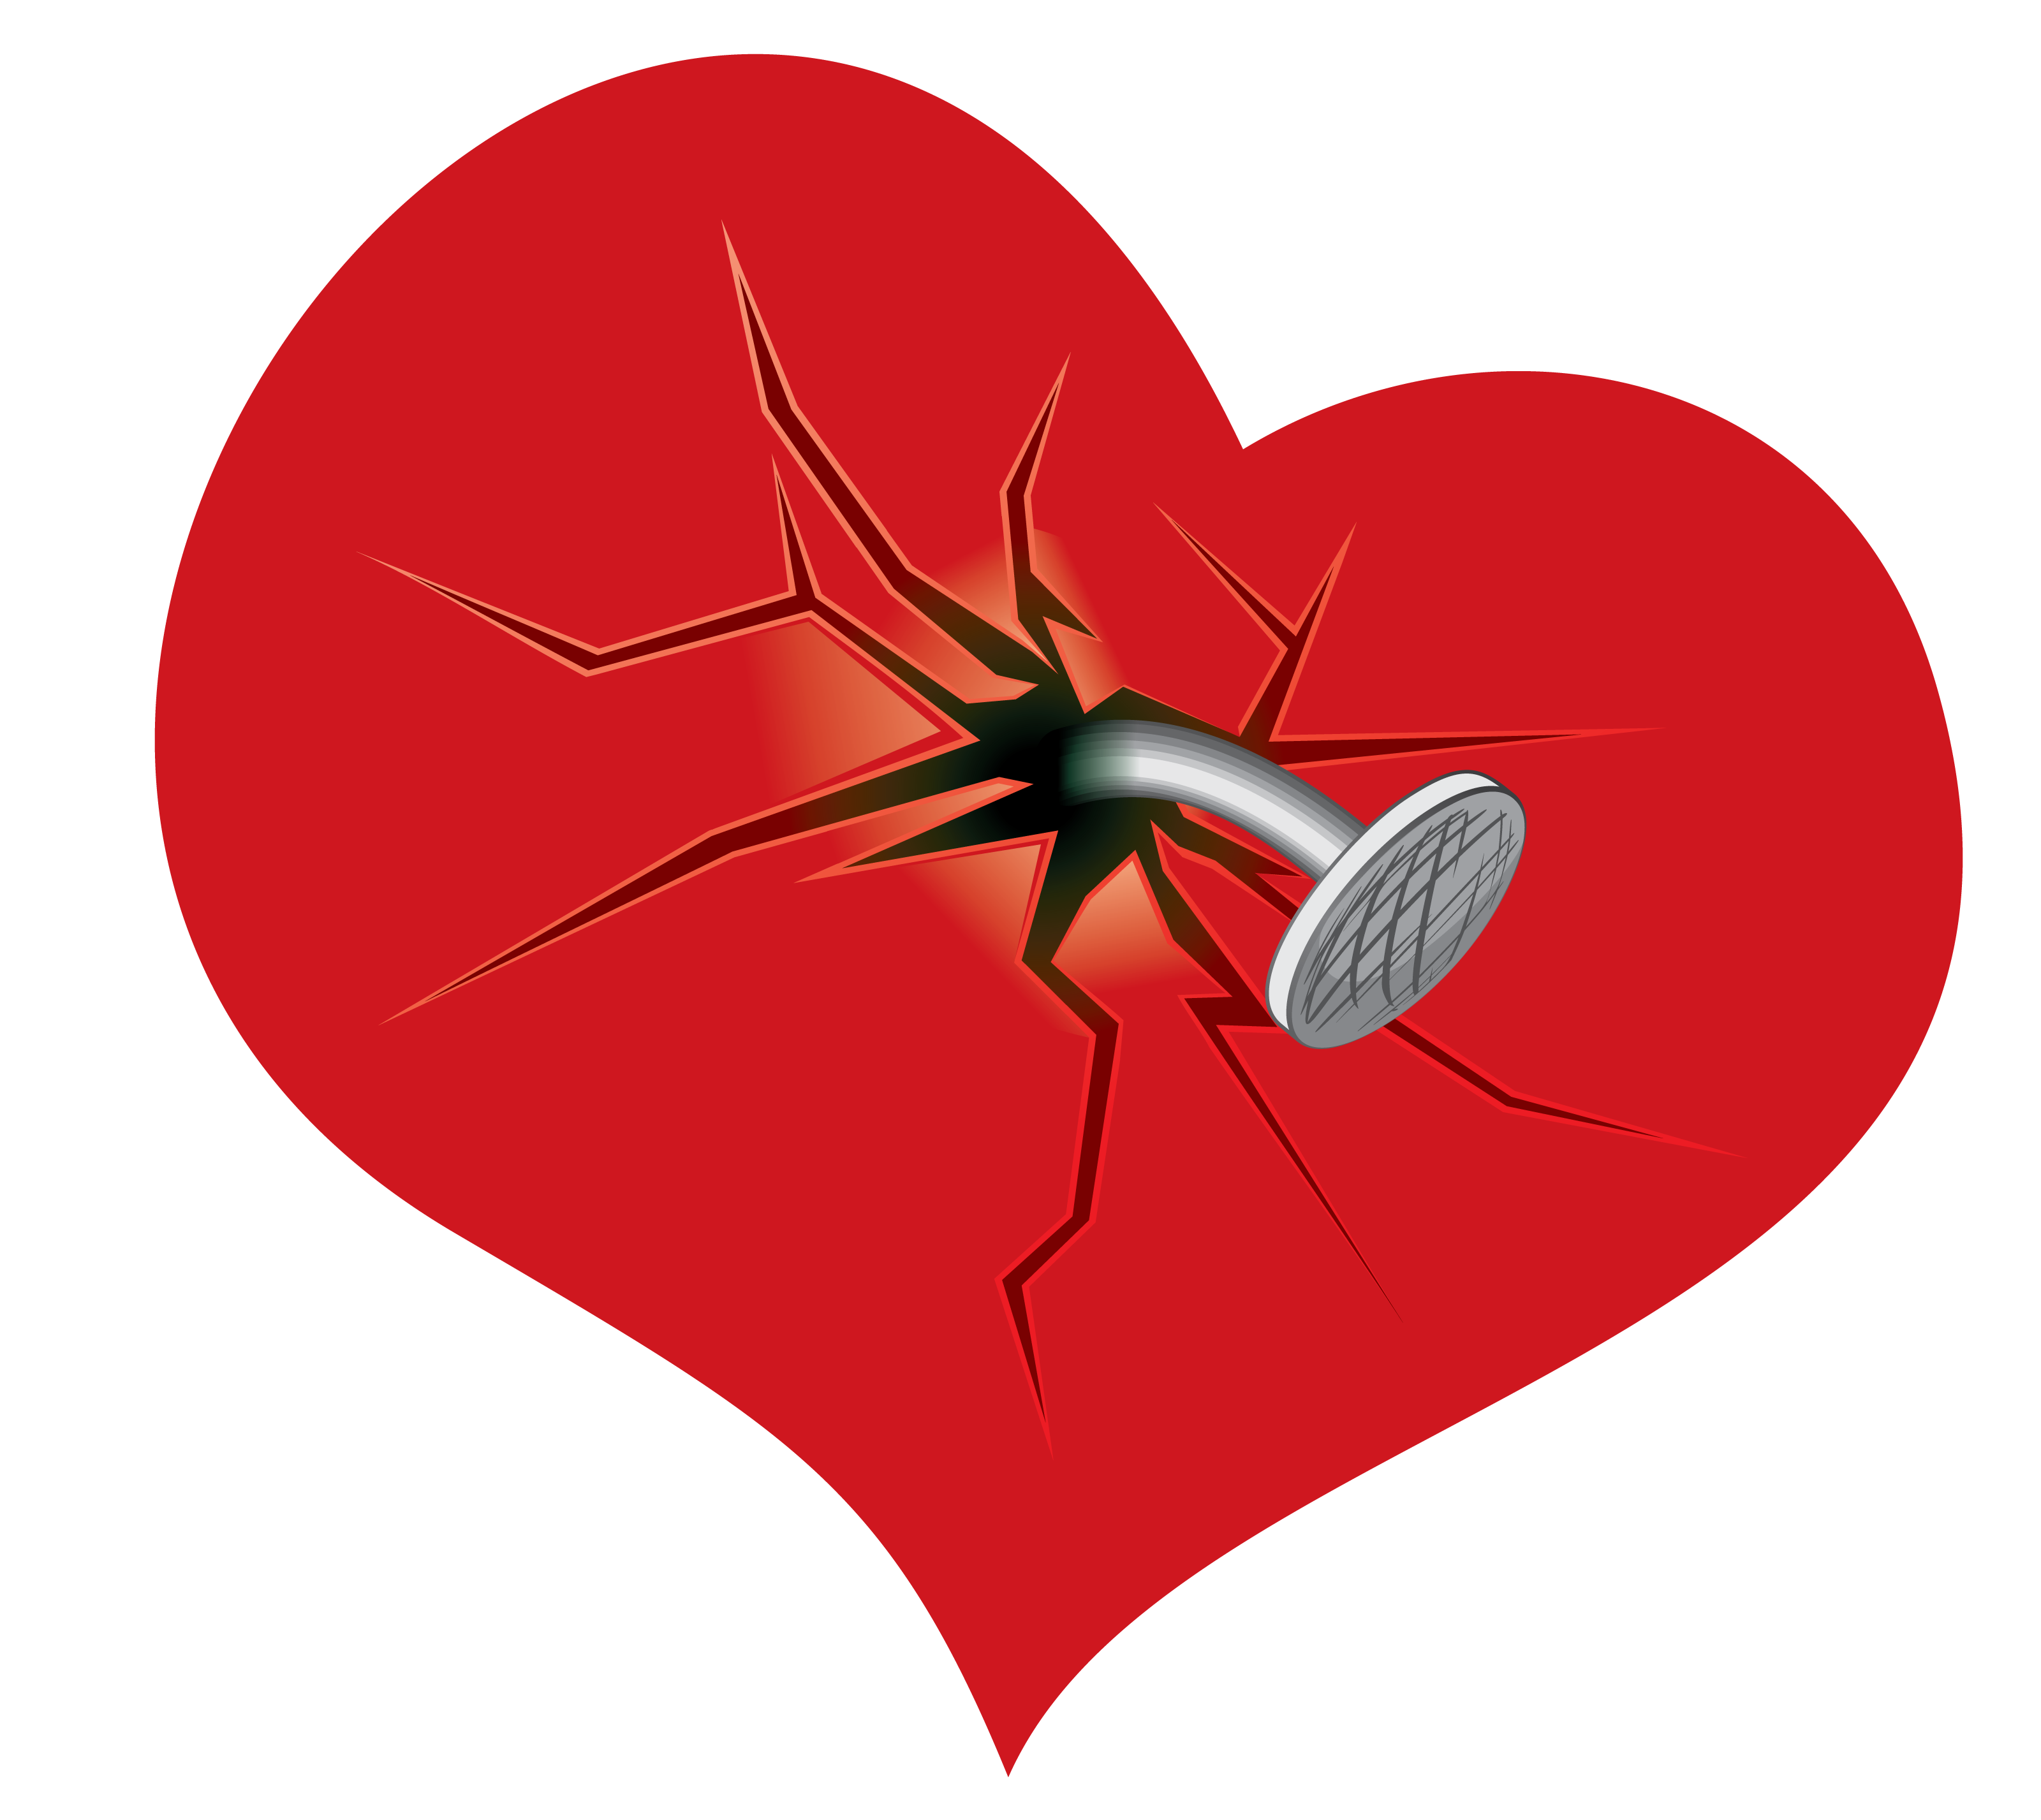 Hurt clipart heart. Broken clip art cracked